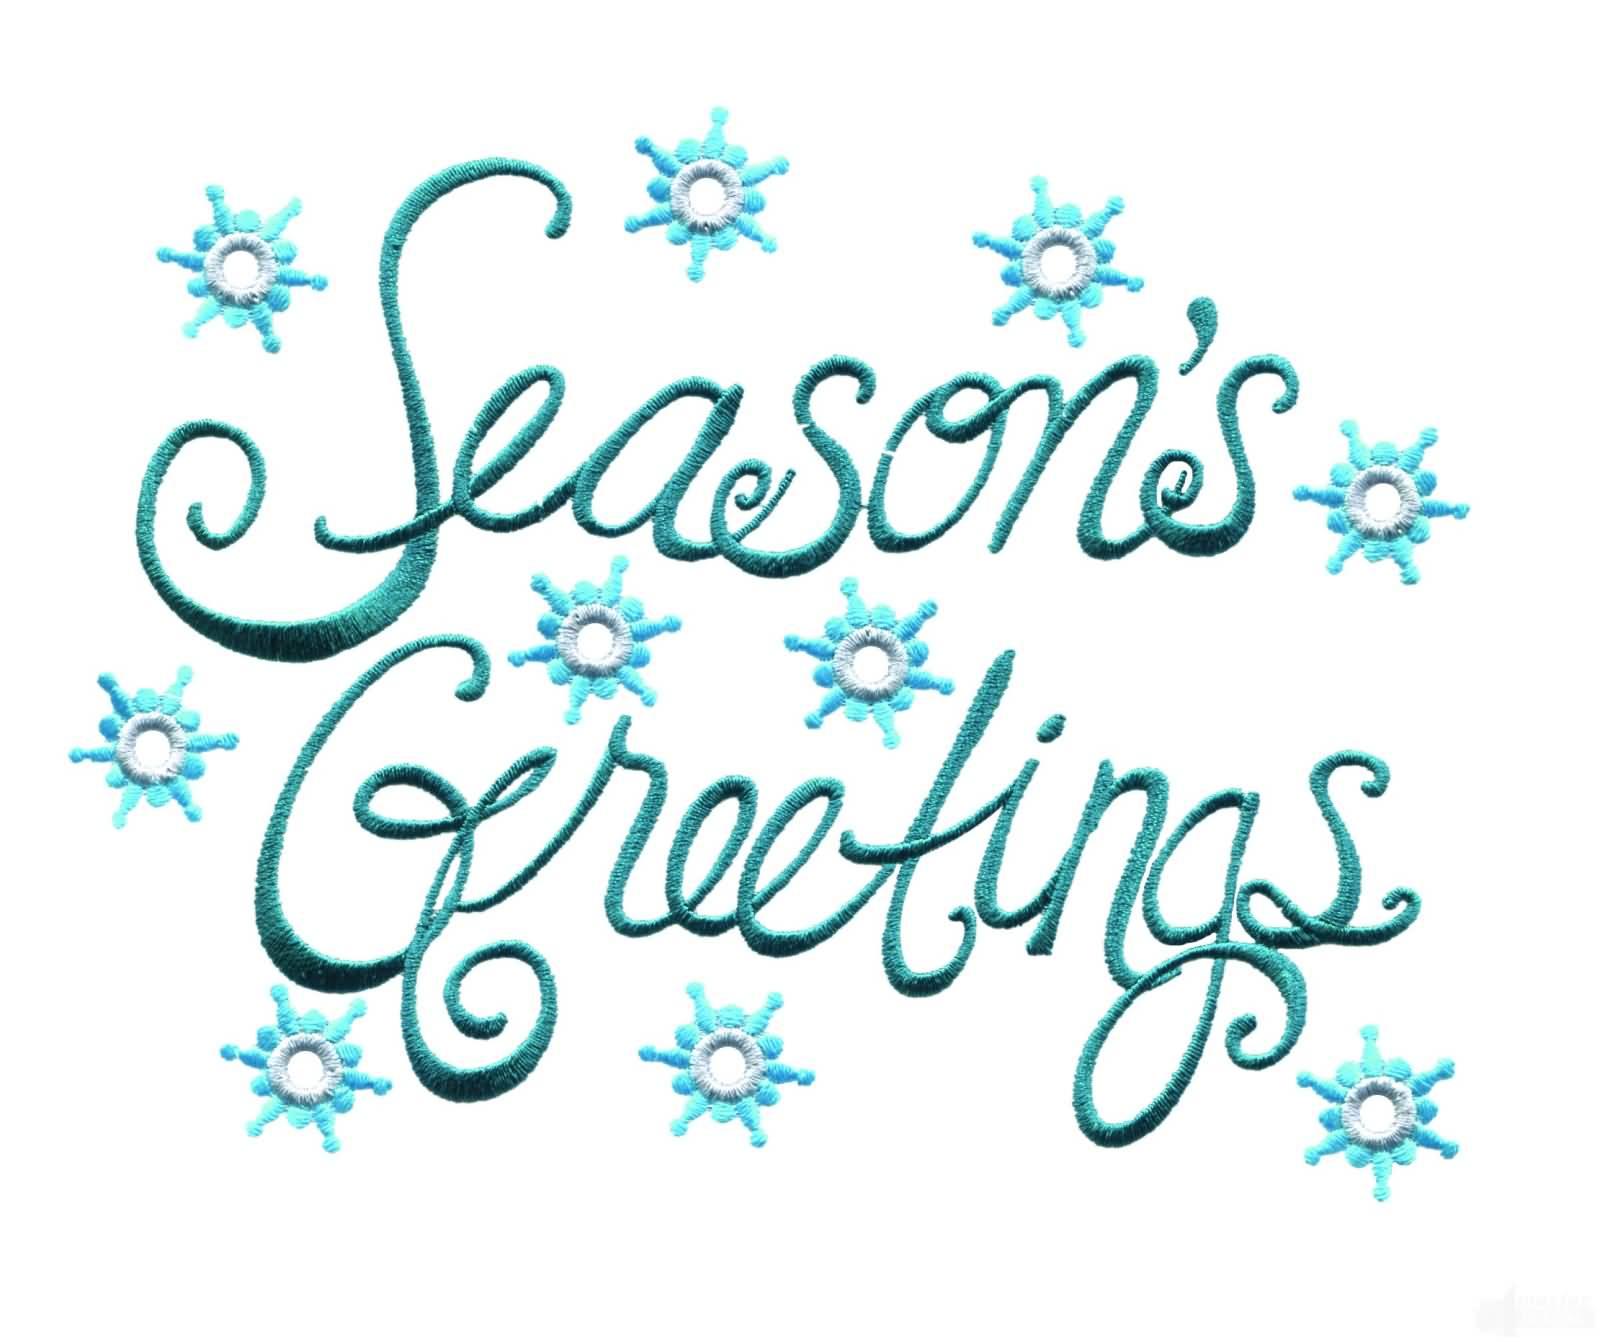 season s greetings clipart rh askideas com seasons greetings clipart free download season's greetings clipart